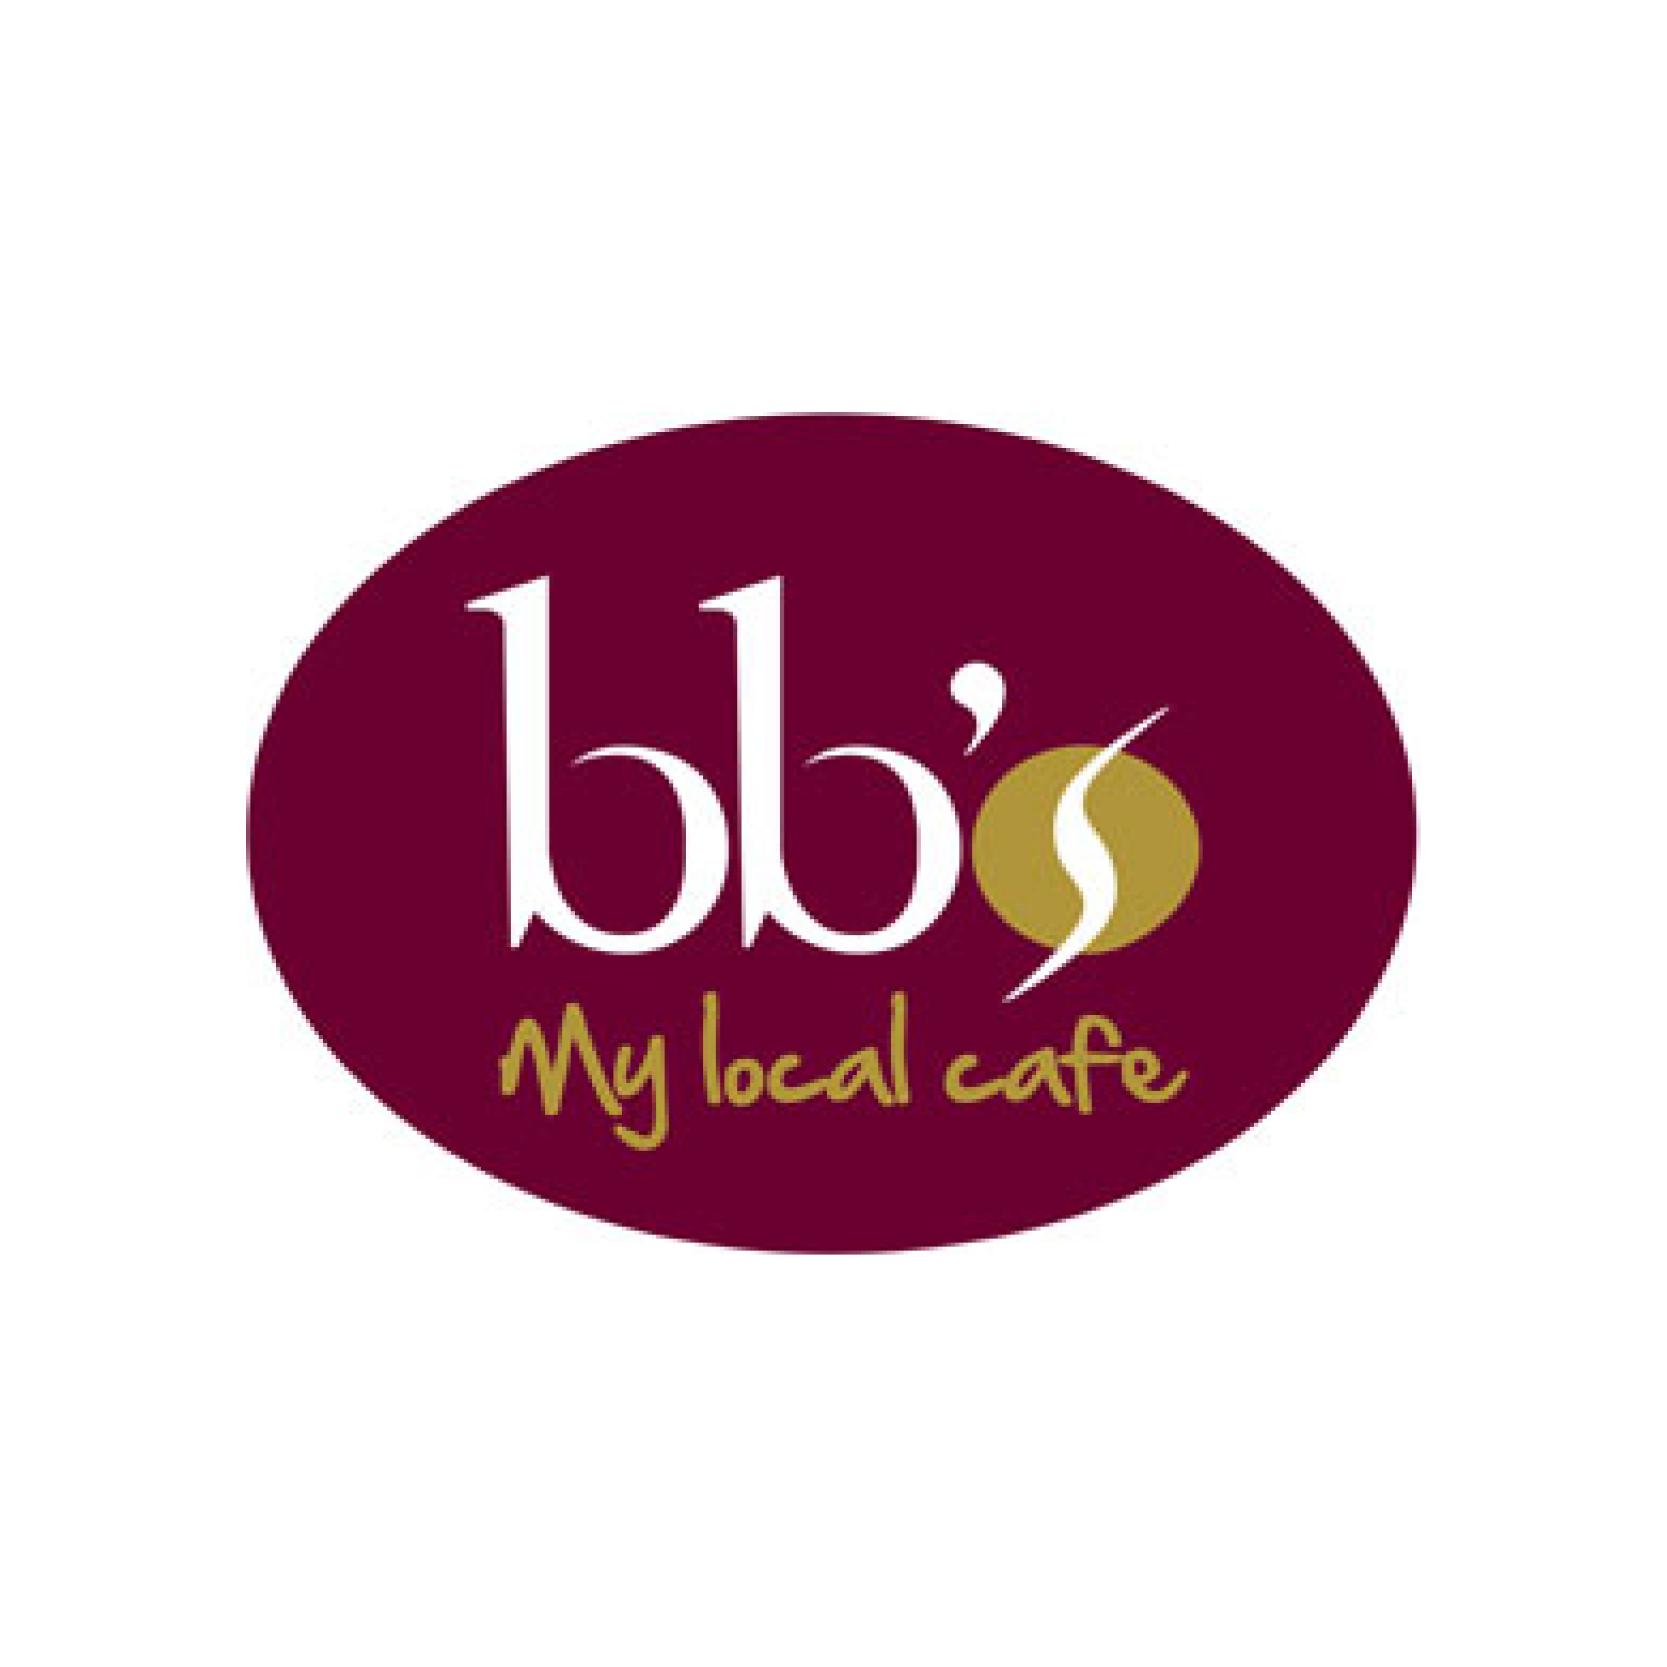 BBS Cafe